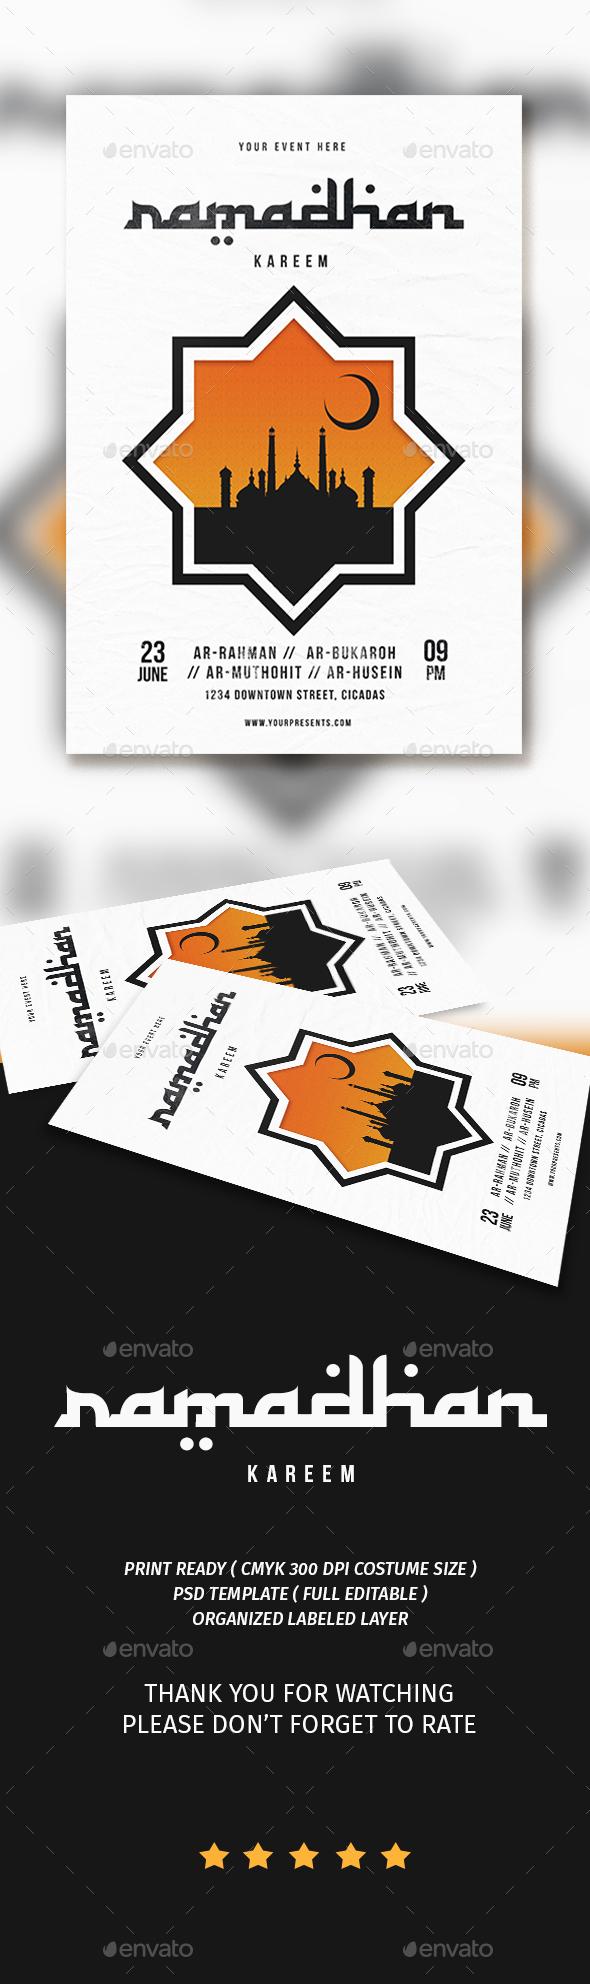 Ramadhan kareem flyer - Flyers Print Templates